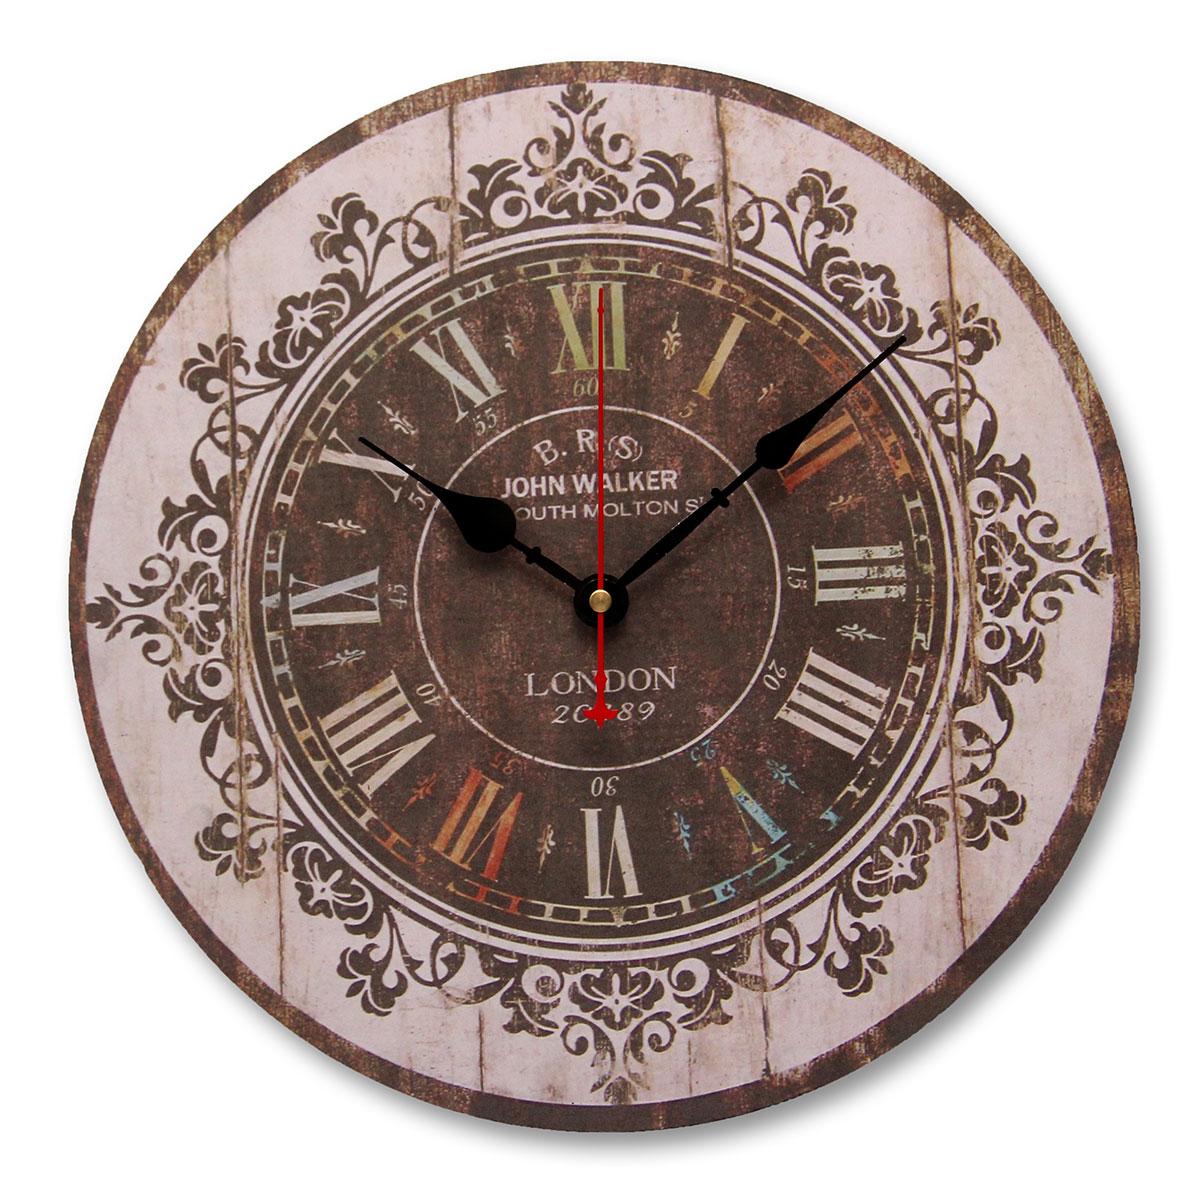 horloge 34cm style ancienne grande pendule murale ronde balancier cuisine salon achat vente. Black Bedroom Furniture Sets. Home Design Ideas